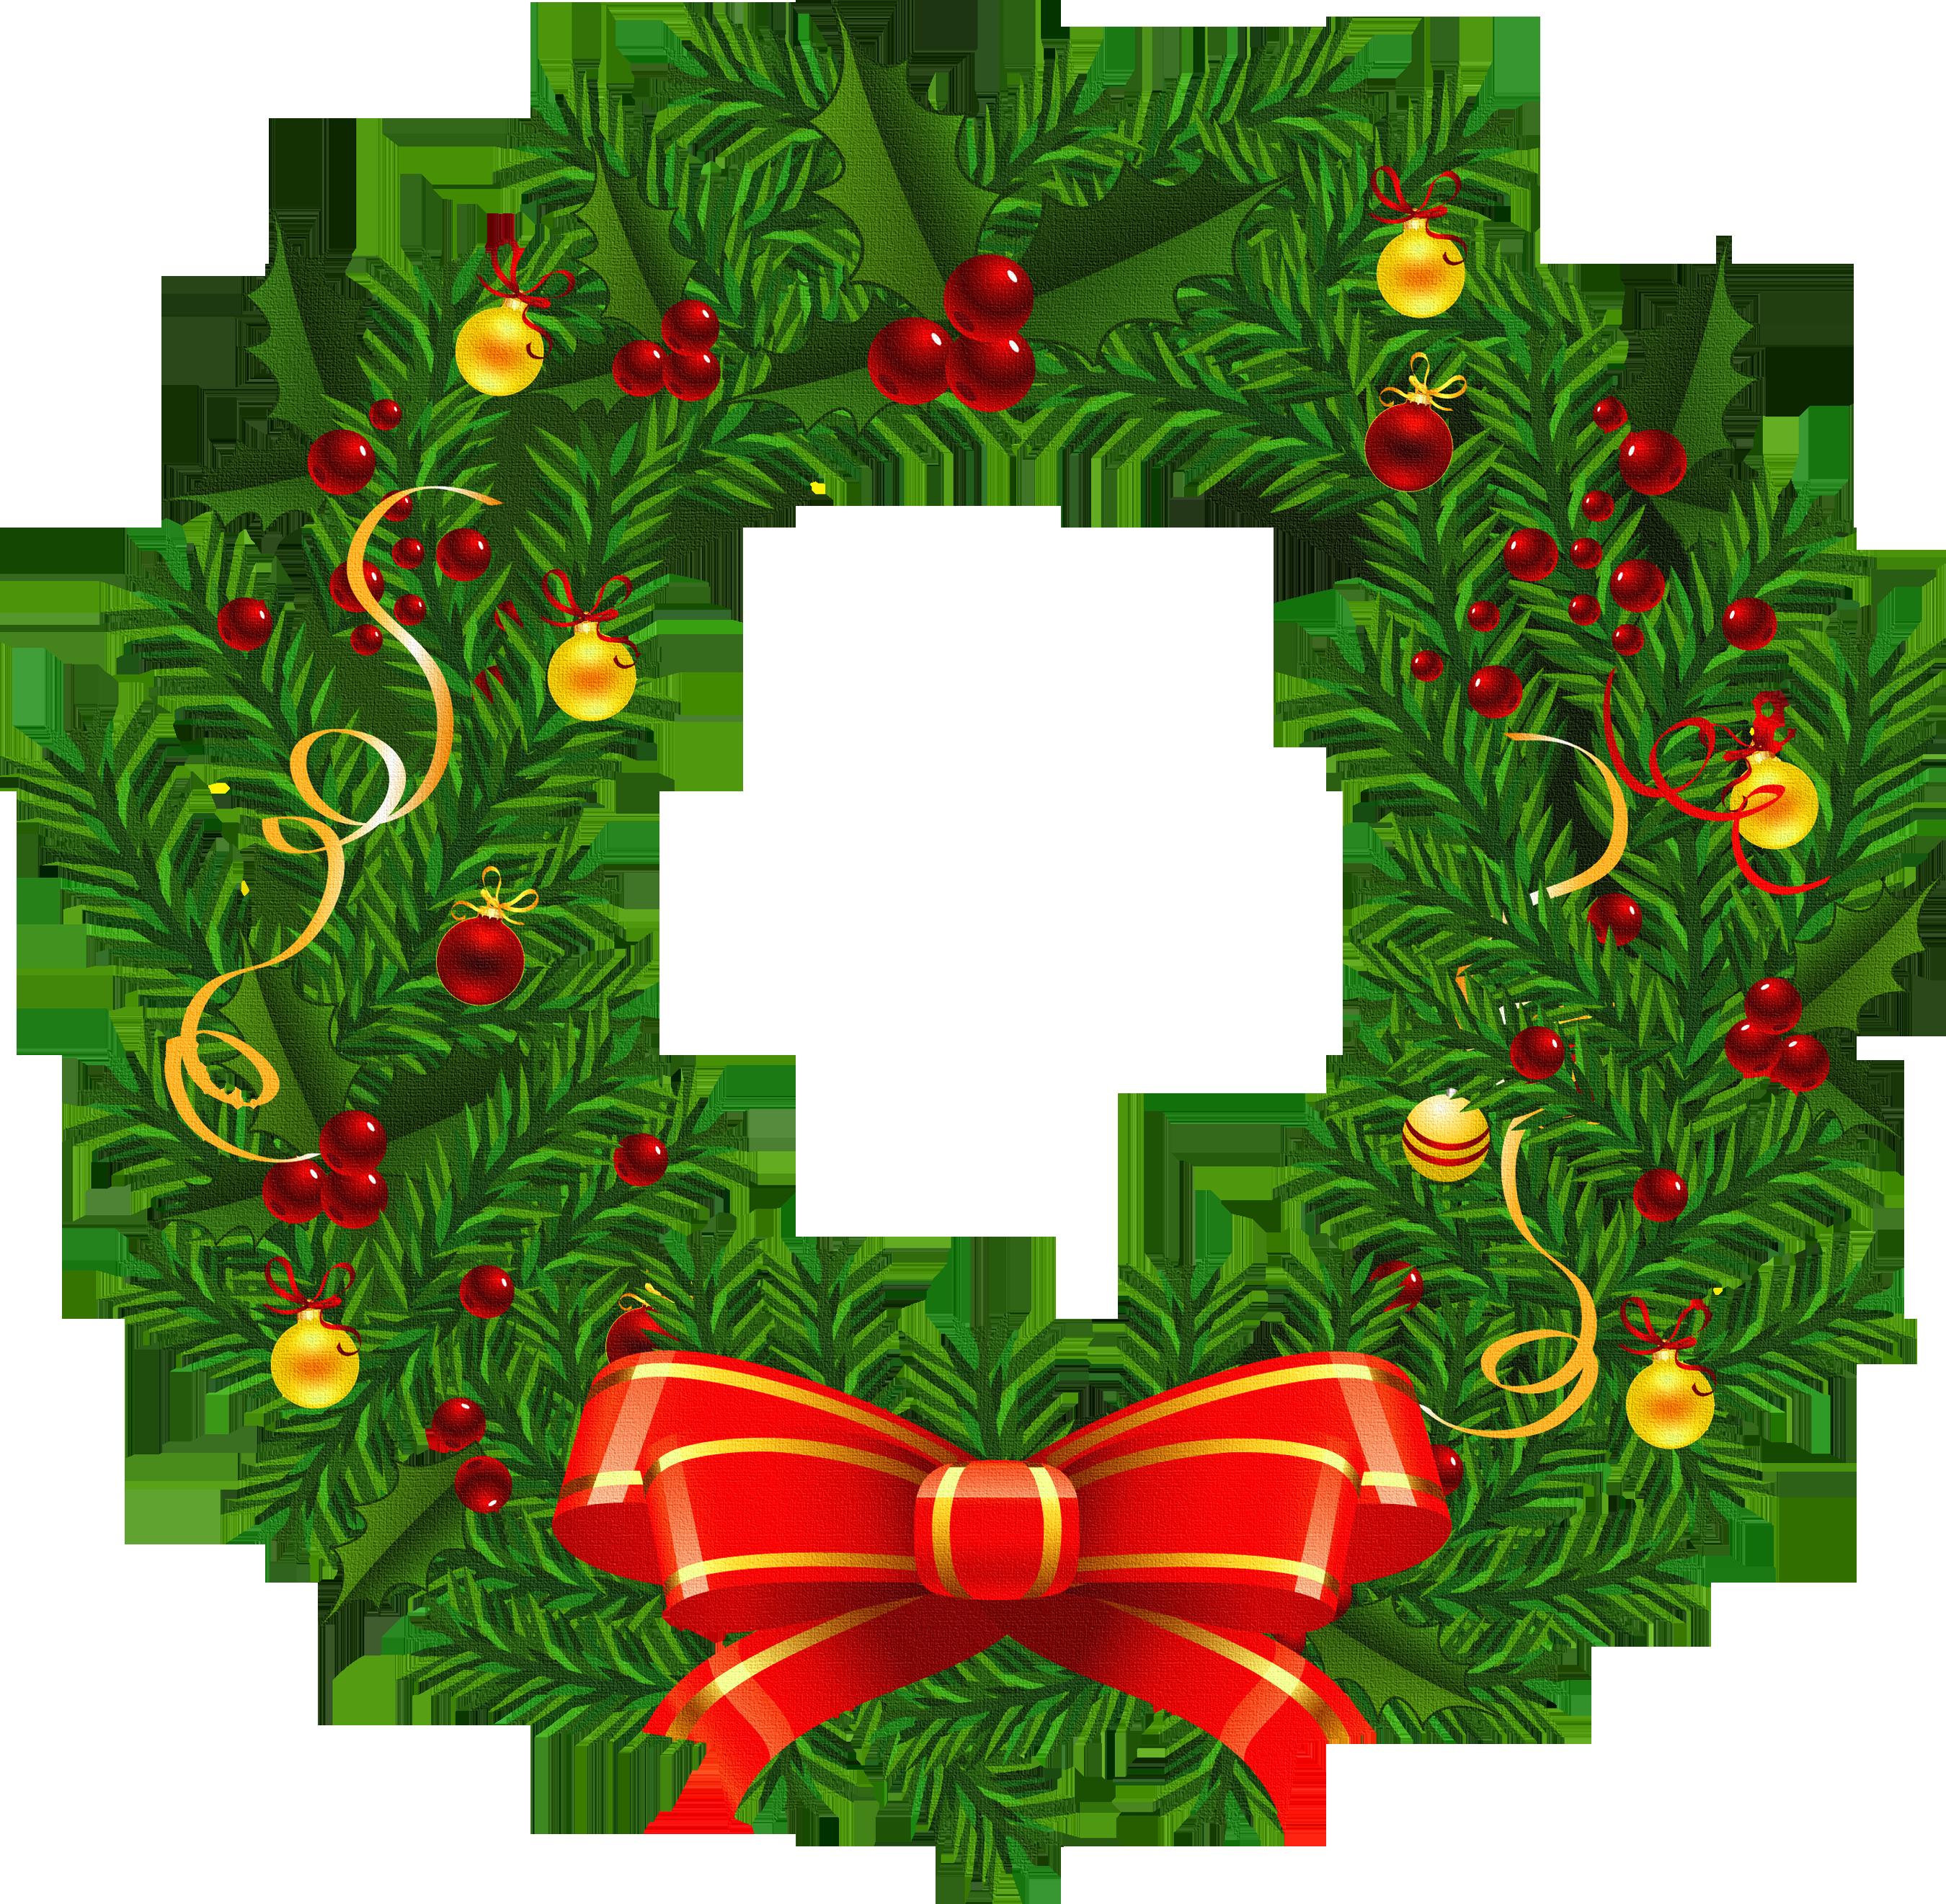 Christmas Wreaths Pictures Clip Art Clip-Christmas Wreaths Pictures Clip Art Clipart Best-10